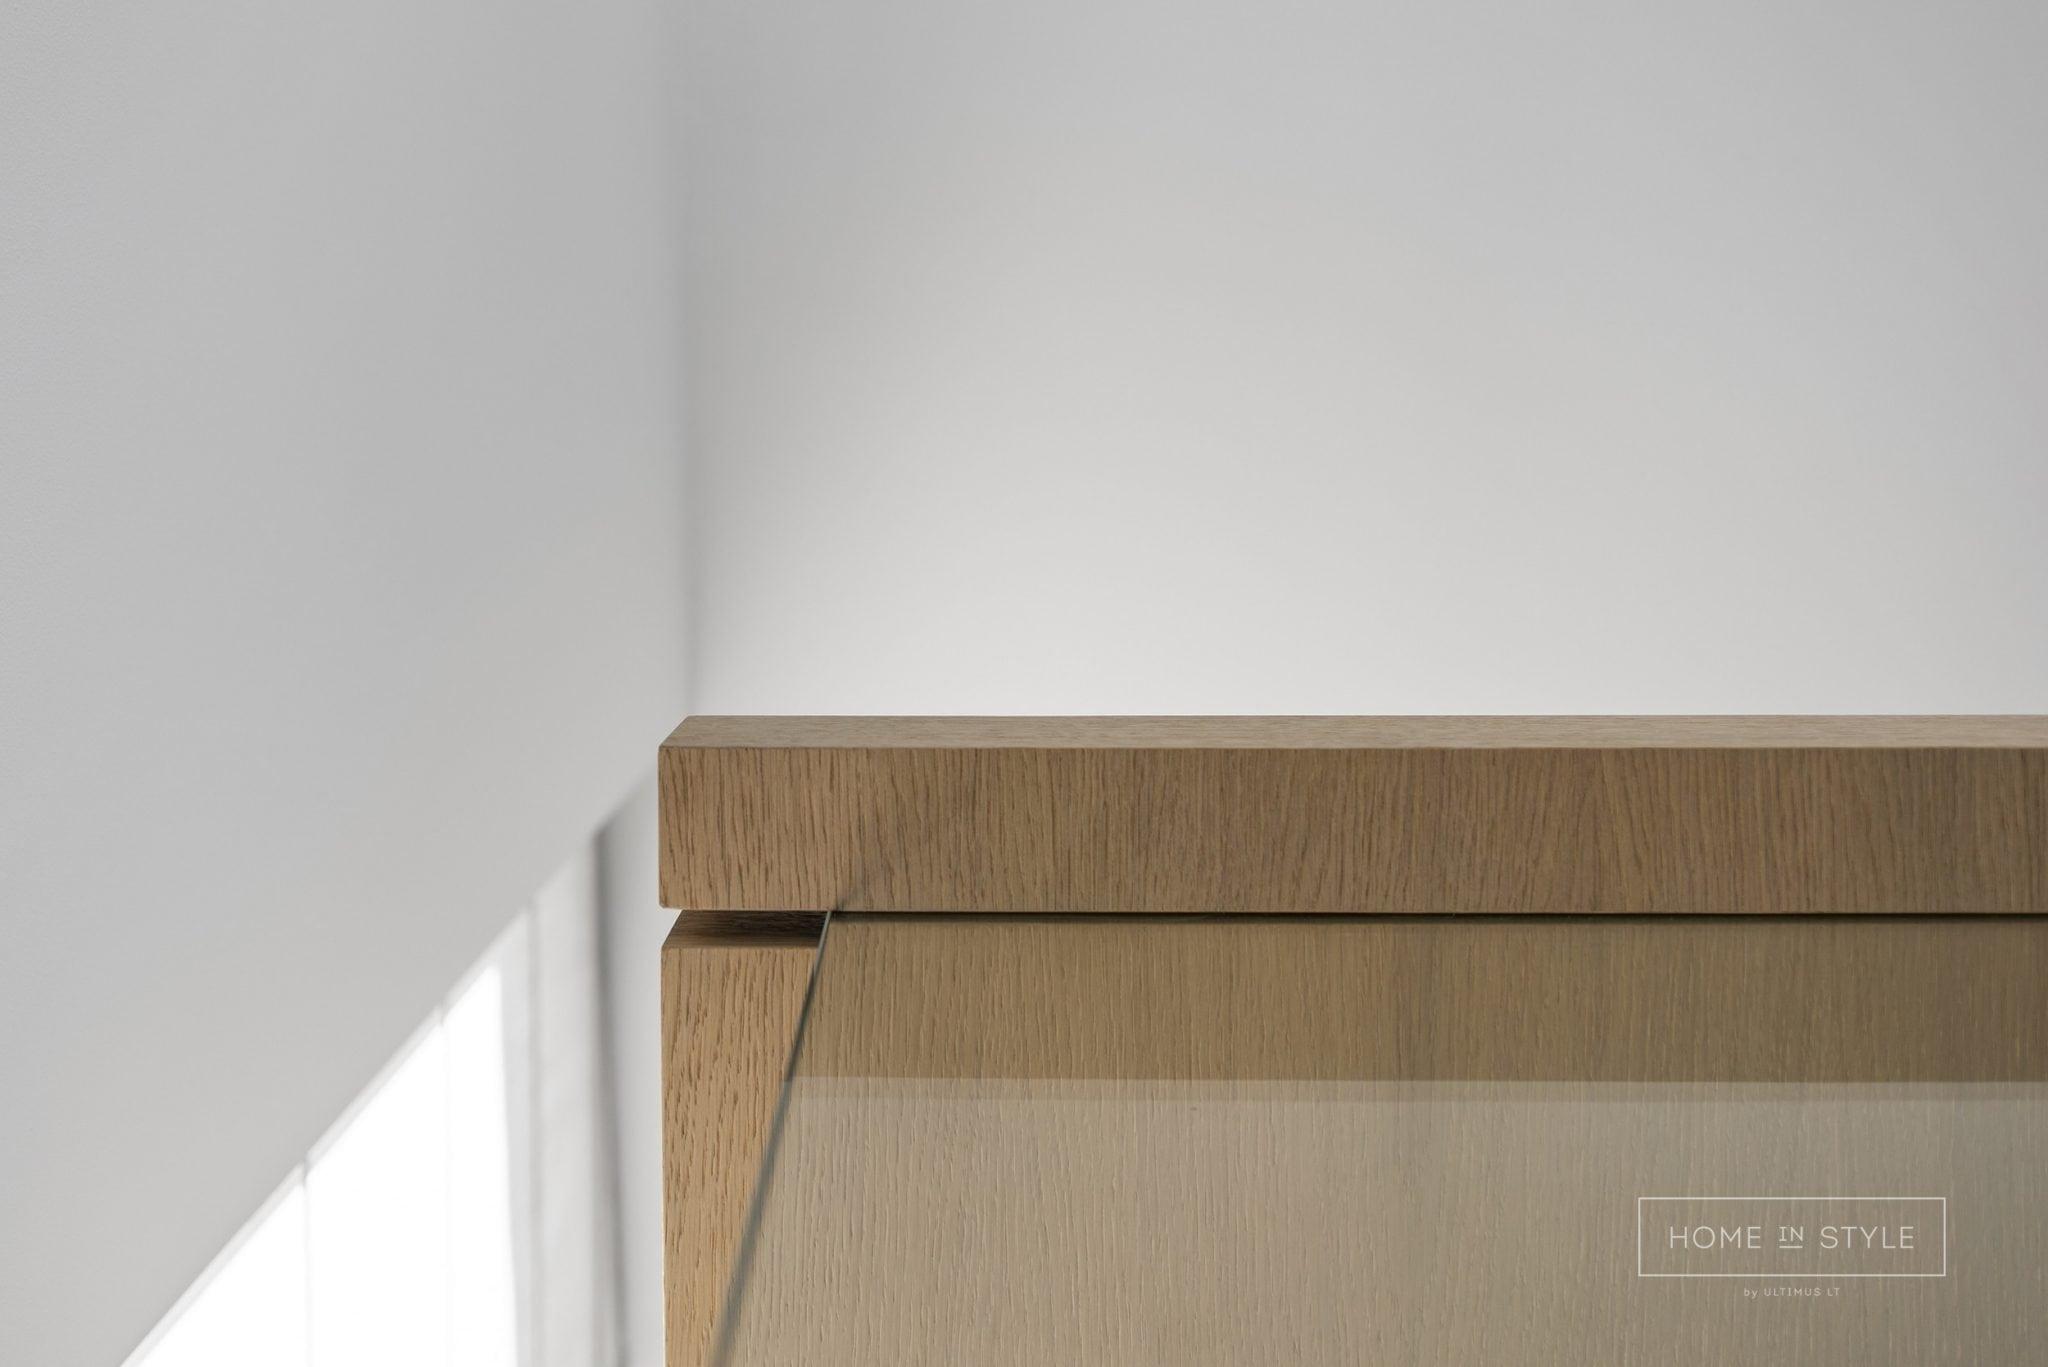 Modernus baldai pagal individualu uzsakyma